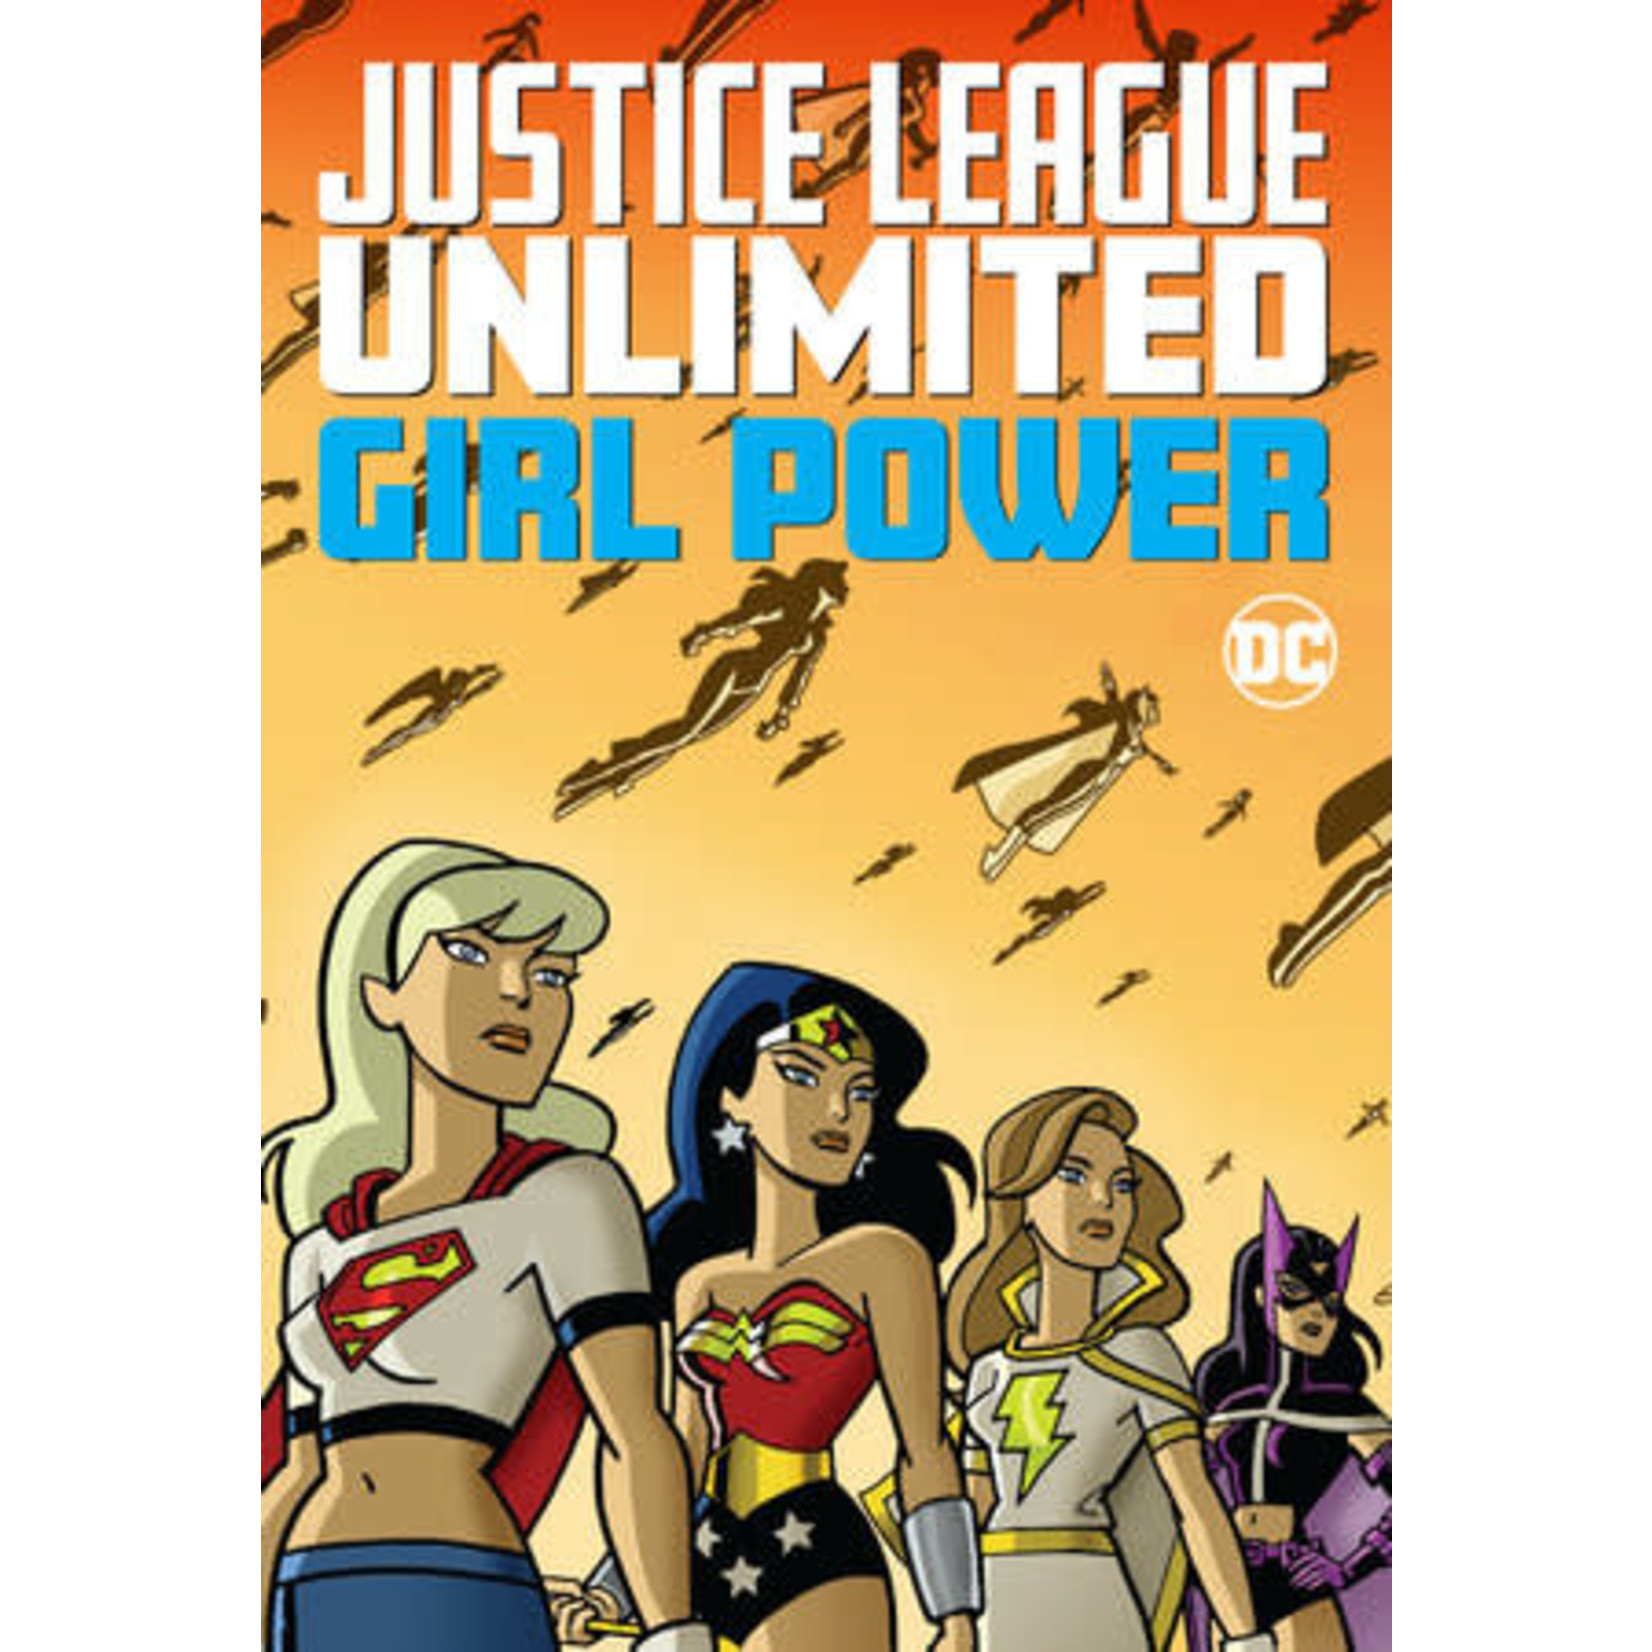 DC Comics Justice League Unlimited Girl Power